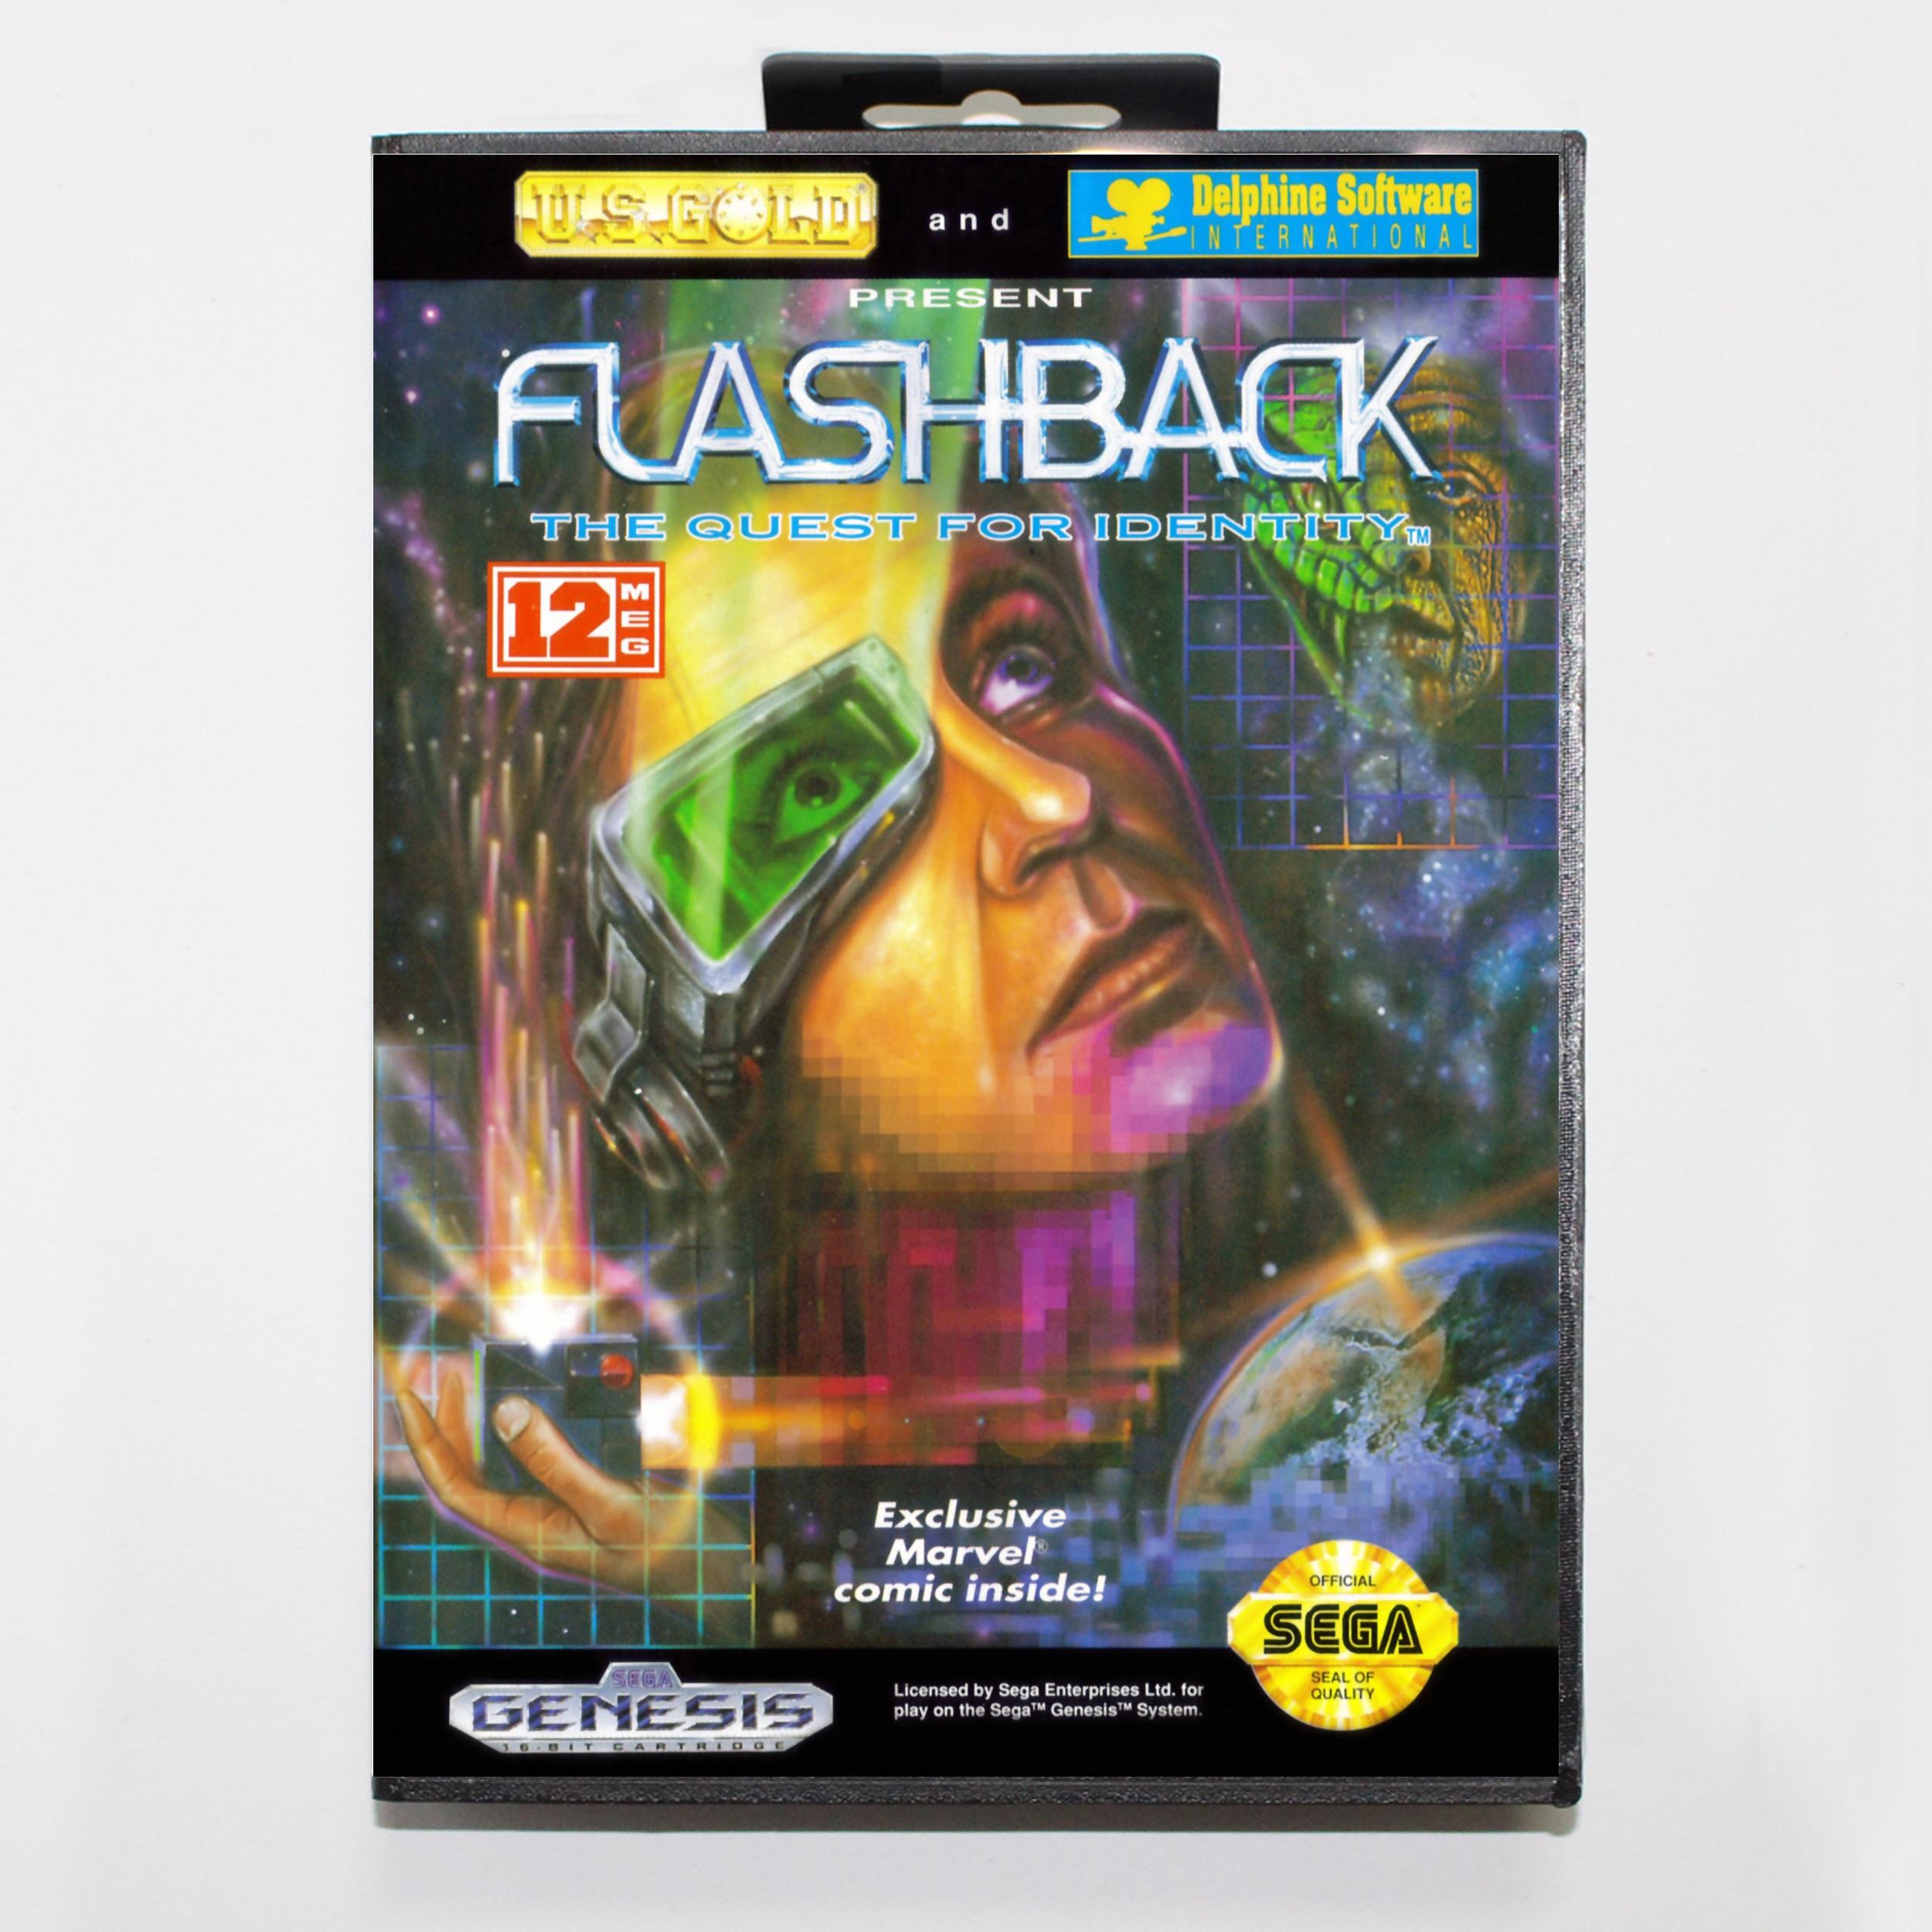 Flashback 16bit MD tarjeta de juego para Sega Mega Drive/Genesis con caja al por menor